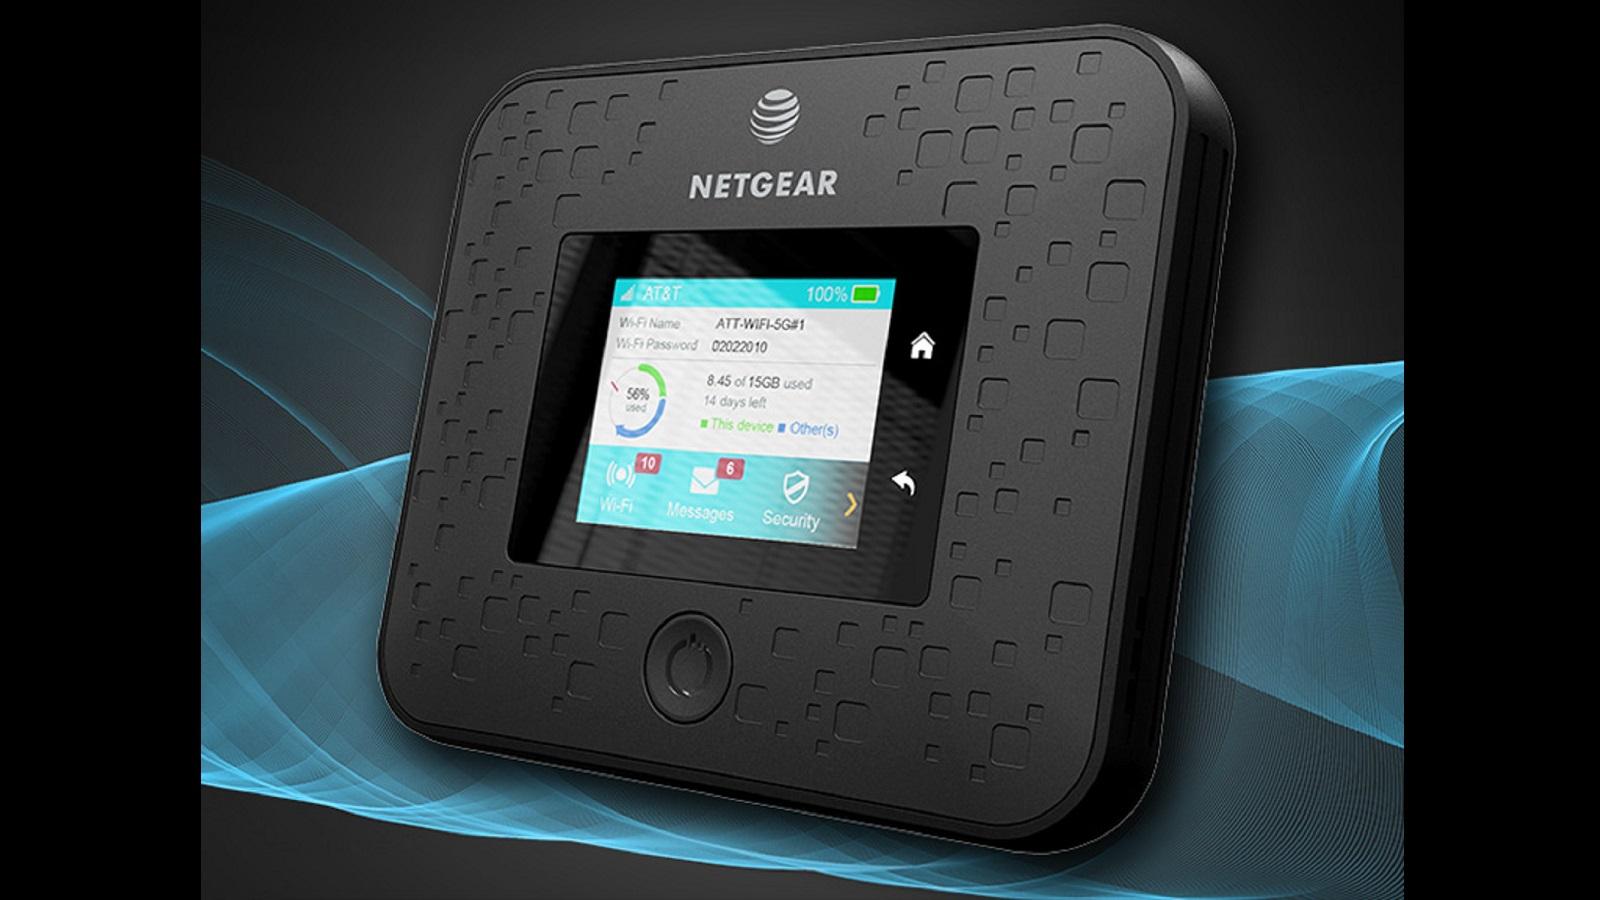 Clear Soft Ultra Slim Screen Protectors For Bq Aquaris M10 10.1 Inch Tablet Protective Film Skilful Manufacture Tablet Screen Protectors